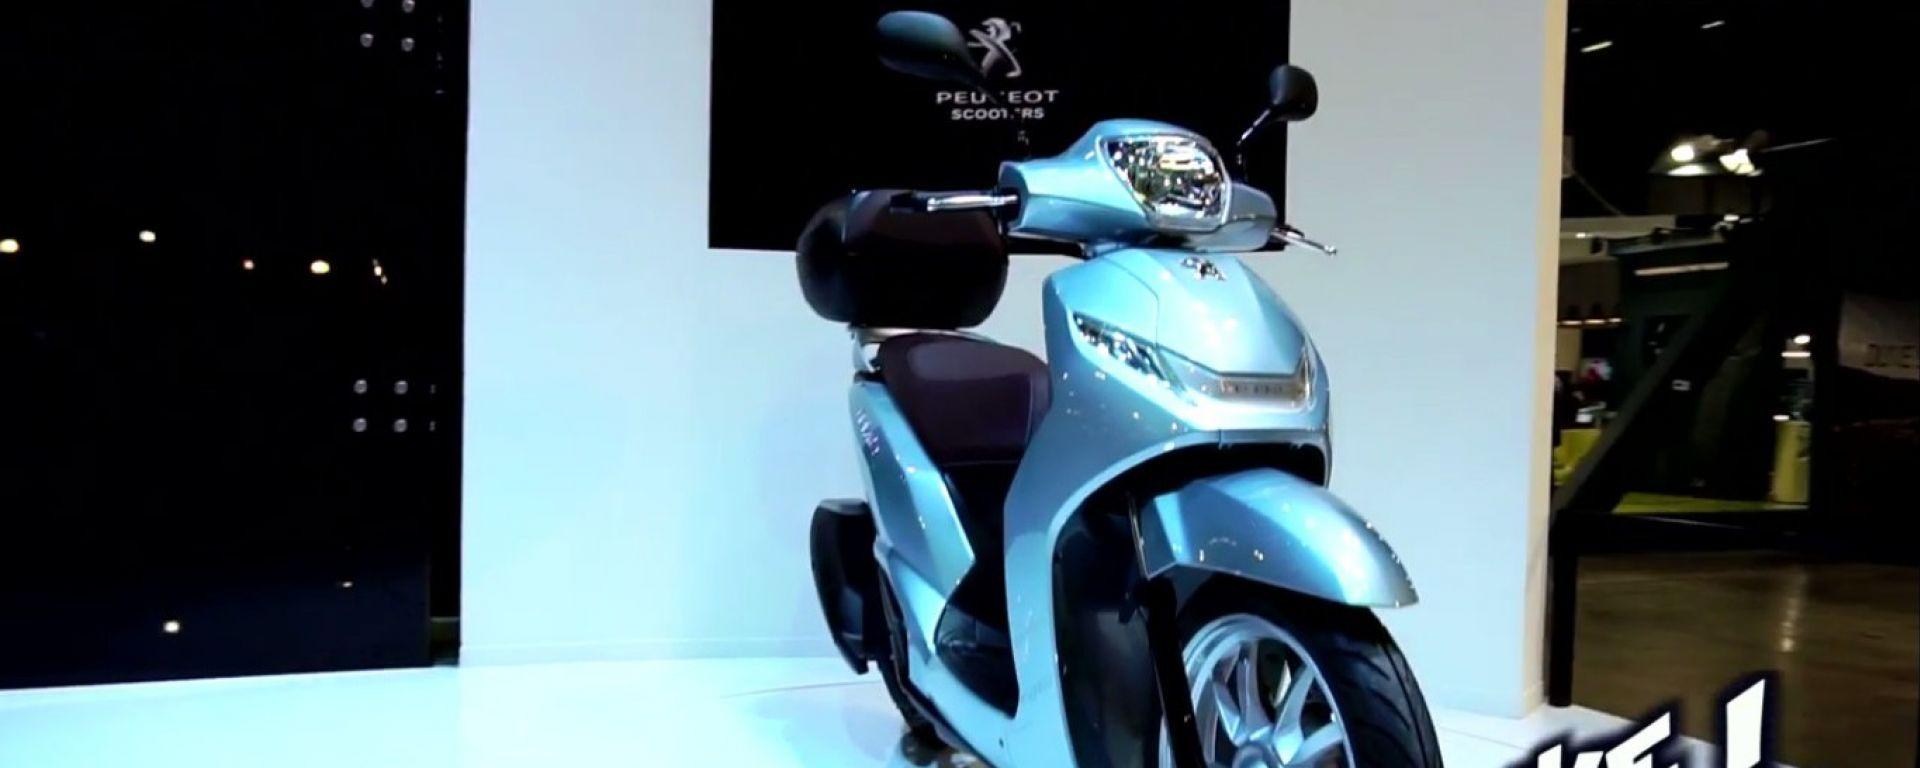 Live Ecima 2016: Peugeot Belville, Metropolis, GenZe e Speedfight in video